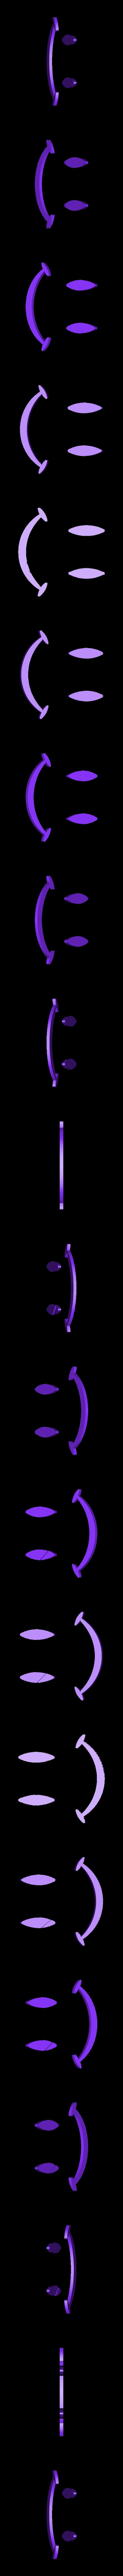 yeux_bouche.stl Download STL file Hand Spinner Watchmen • 3D printer model, Guich